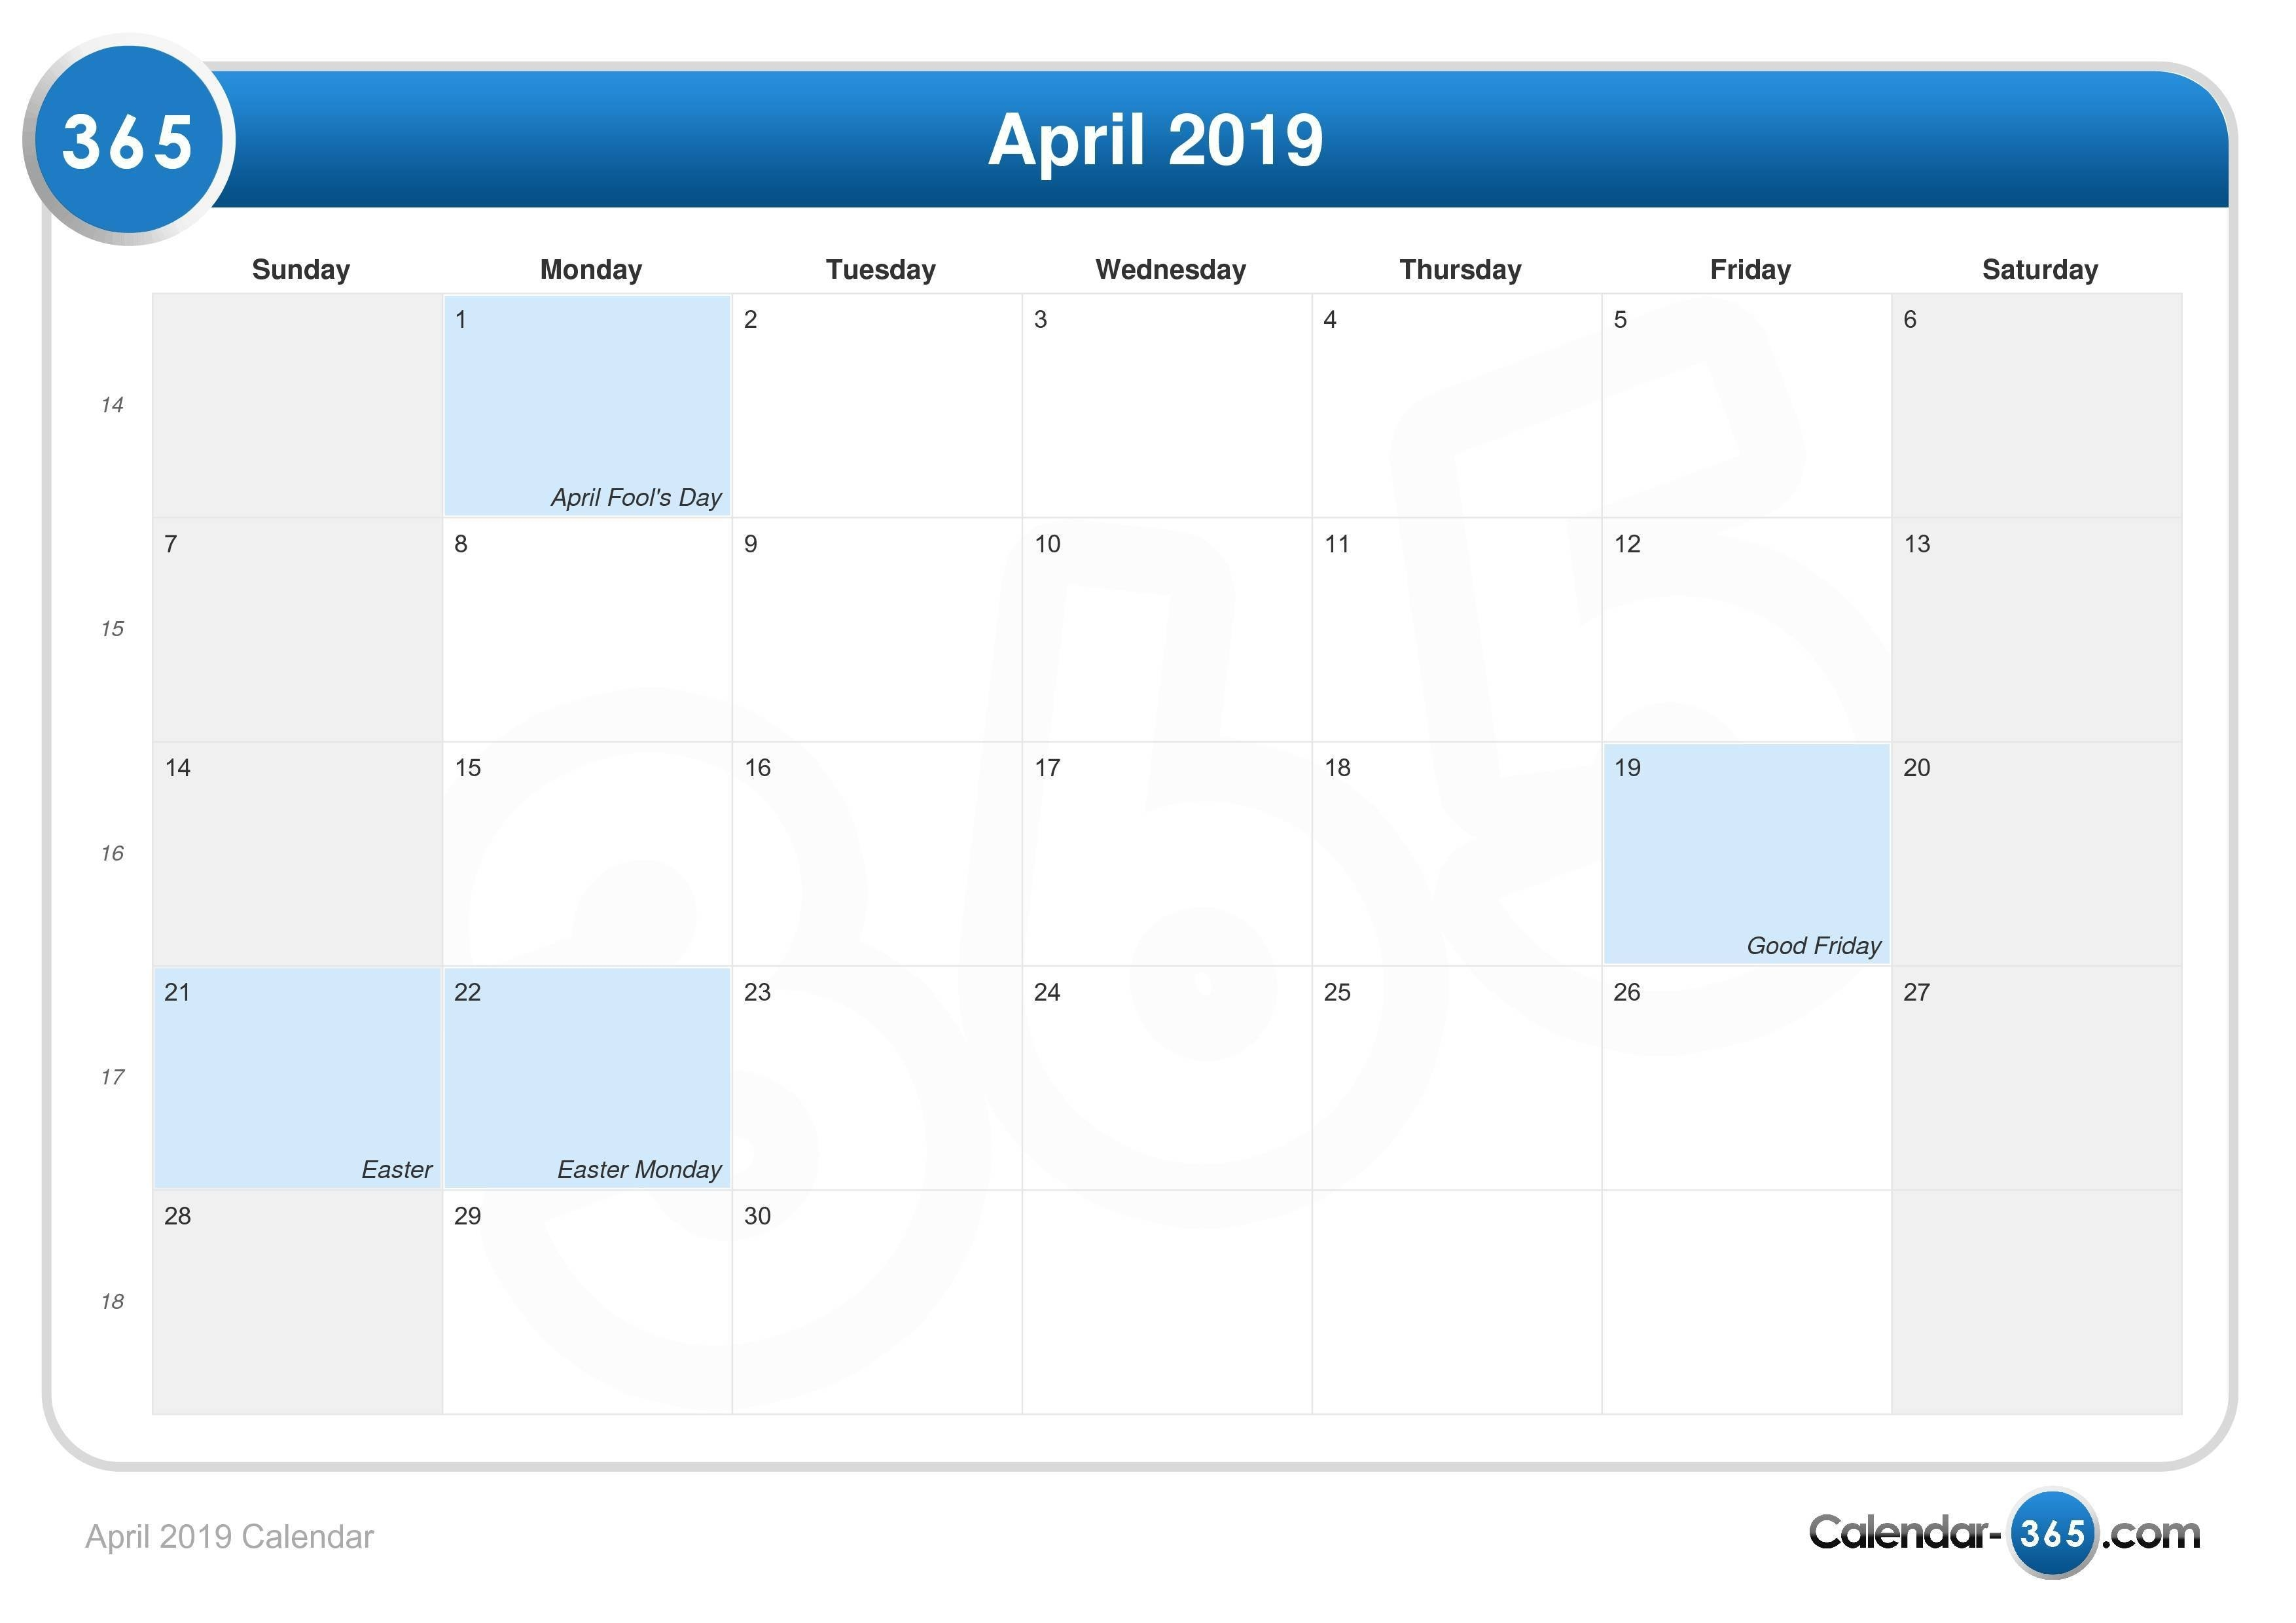 April 2019 Calendar Calendar April 6 2019